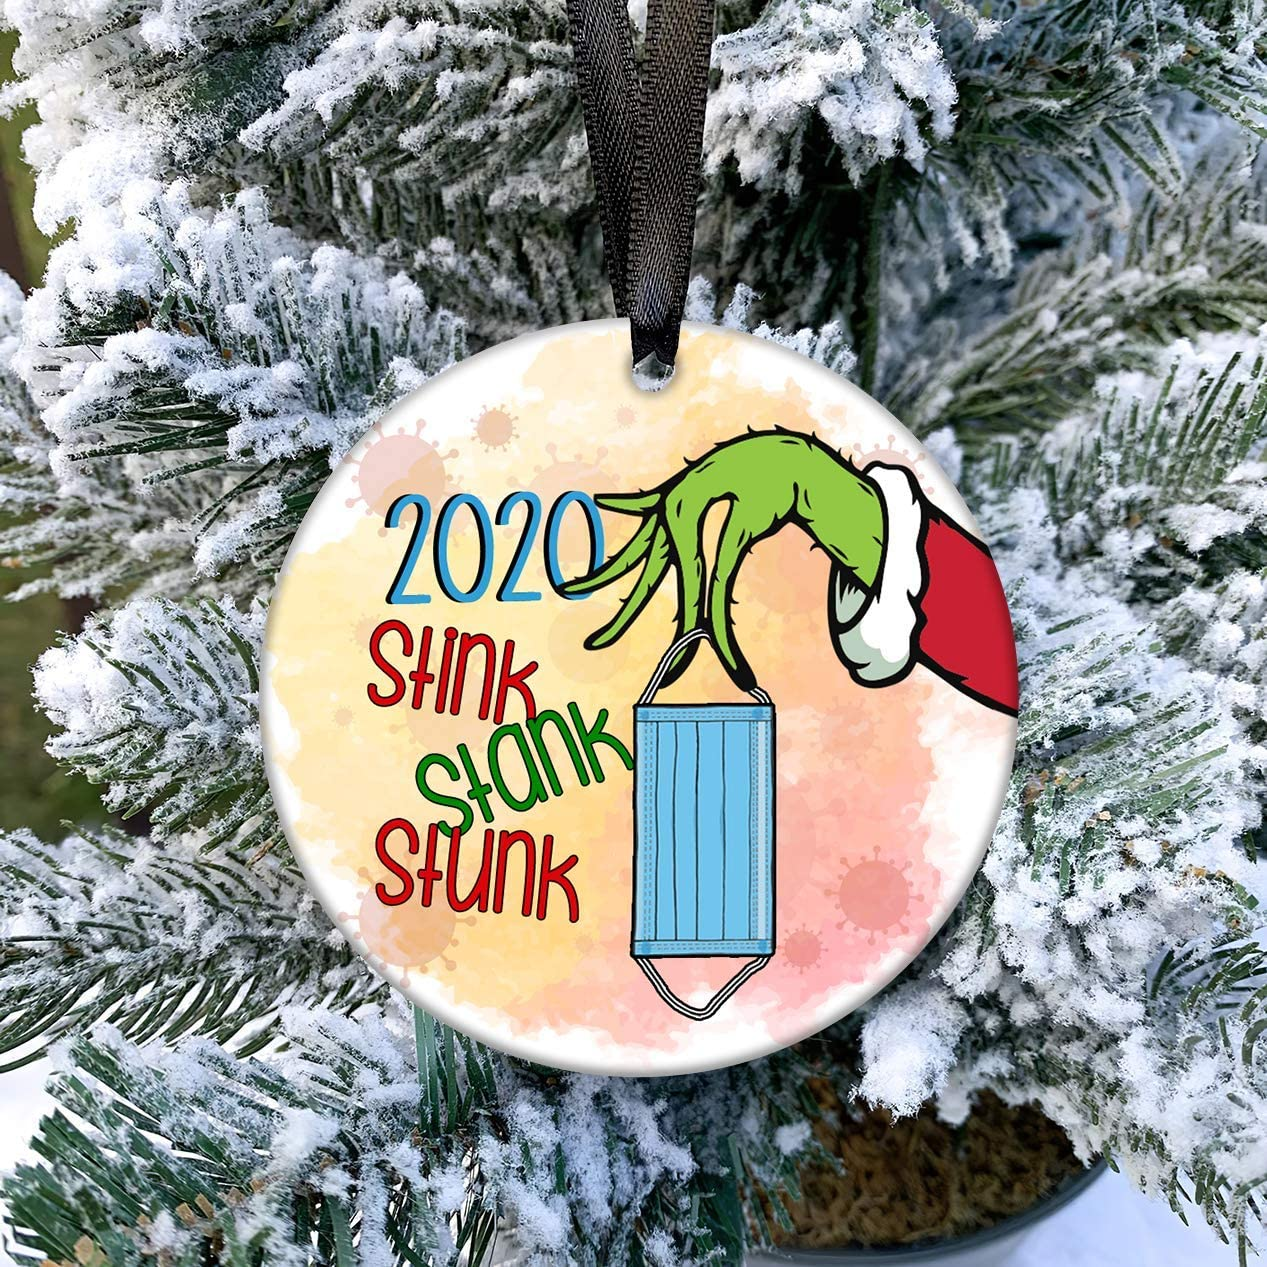 Popeven Grinch Hand 2020 Christmas Ornament Stink Stank Stunk 2020 Ceramic Ornament Holiday Flat Circle Ornament Holiday Xmas Decoration Gift 3 Walmart Com Walmart Com